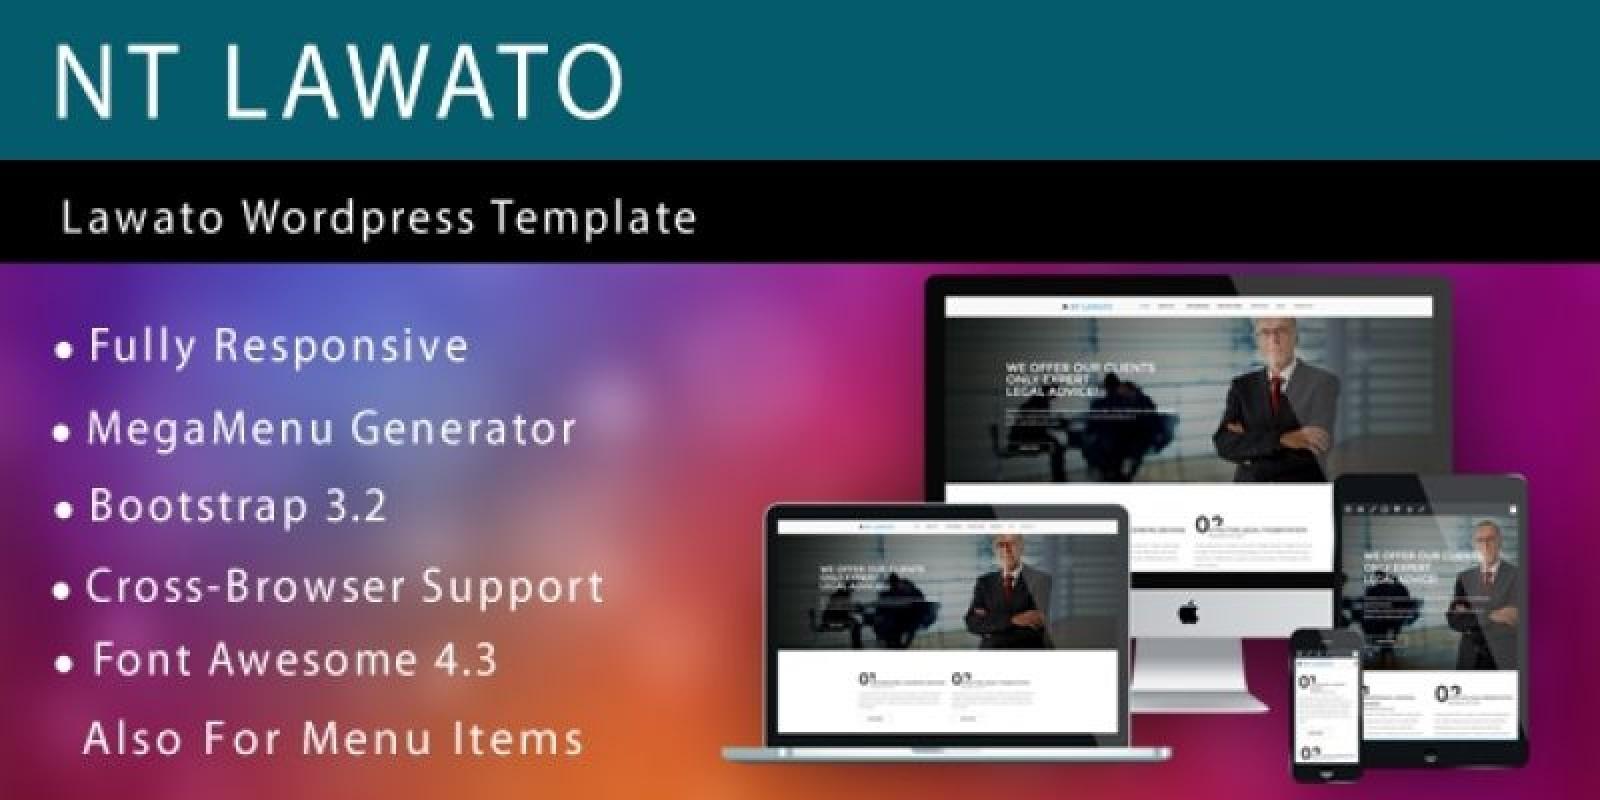 NT Lawato – Wordpress Law Firm Theme